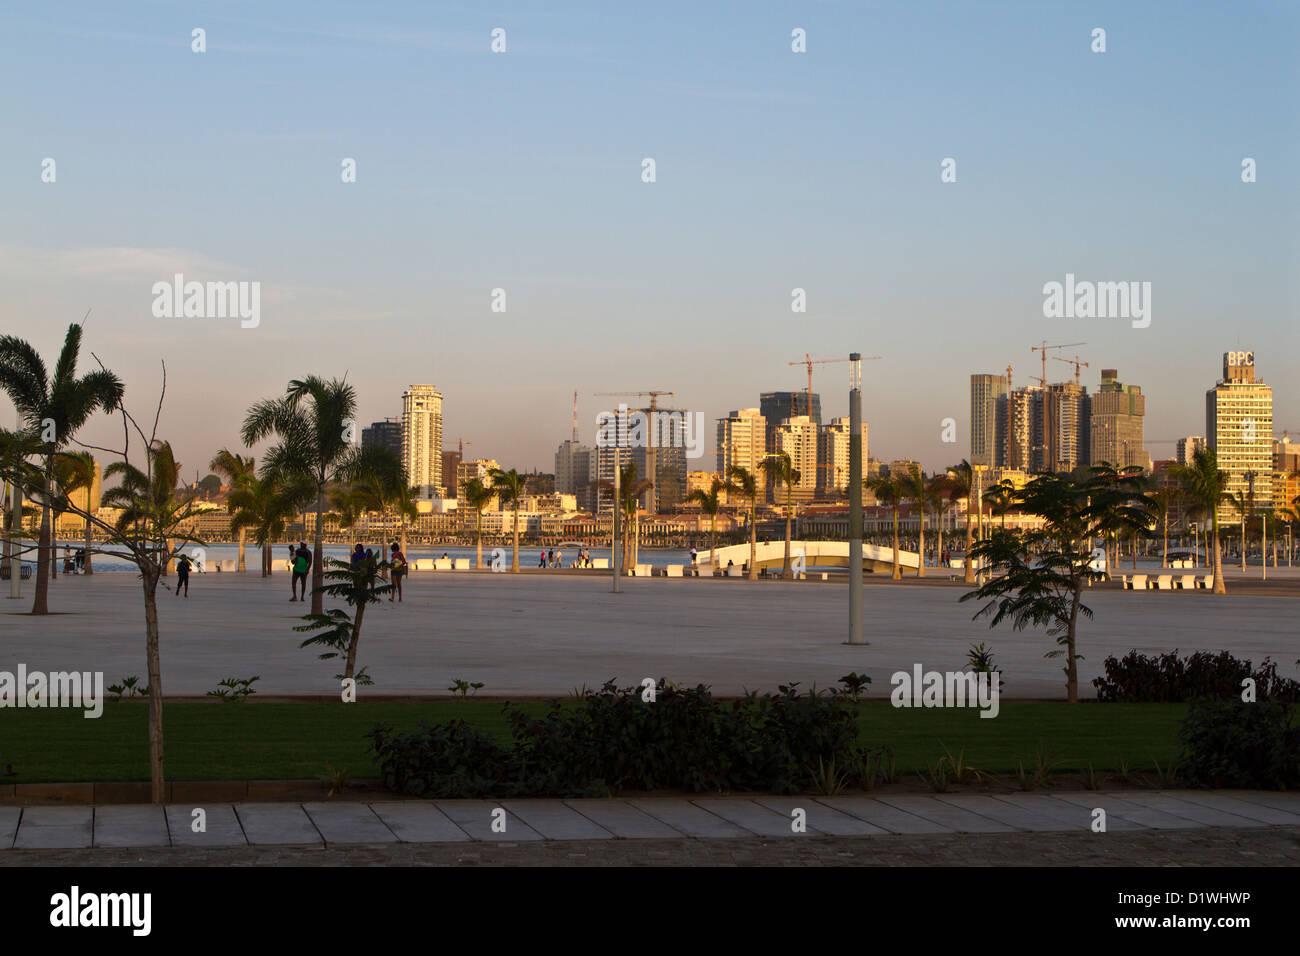 Marginal of Luanda, Angola - Stock Image